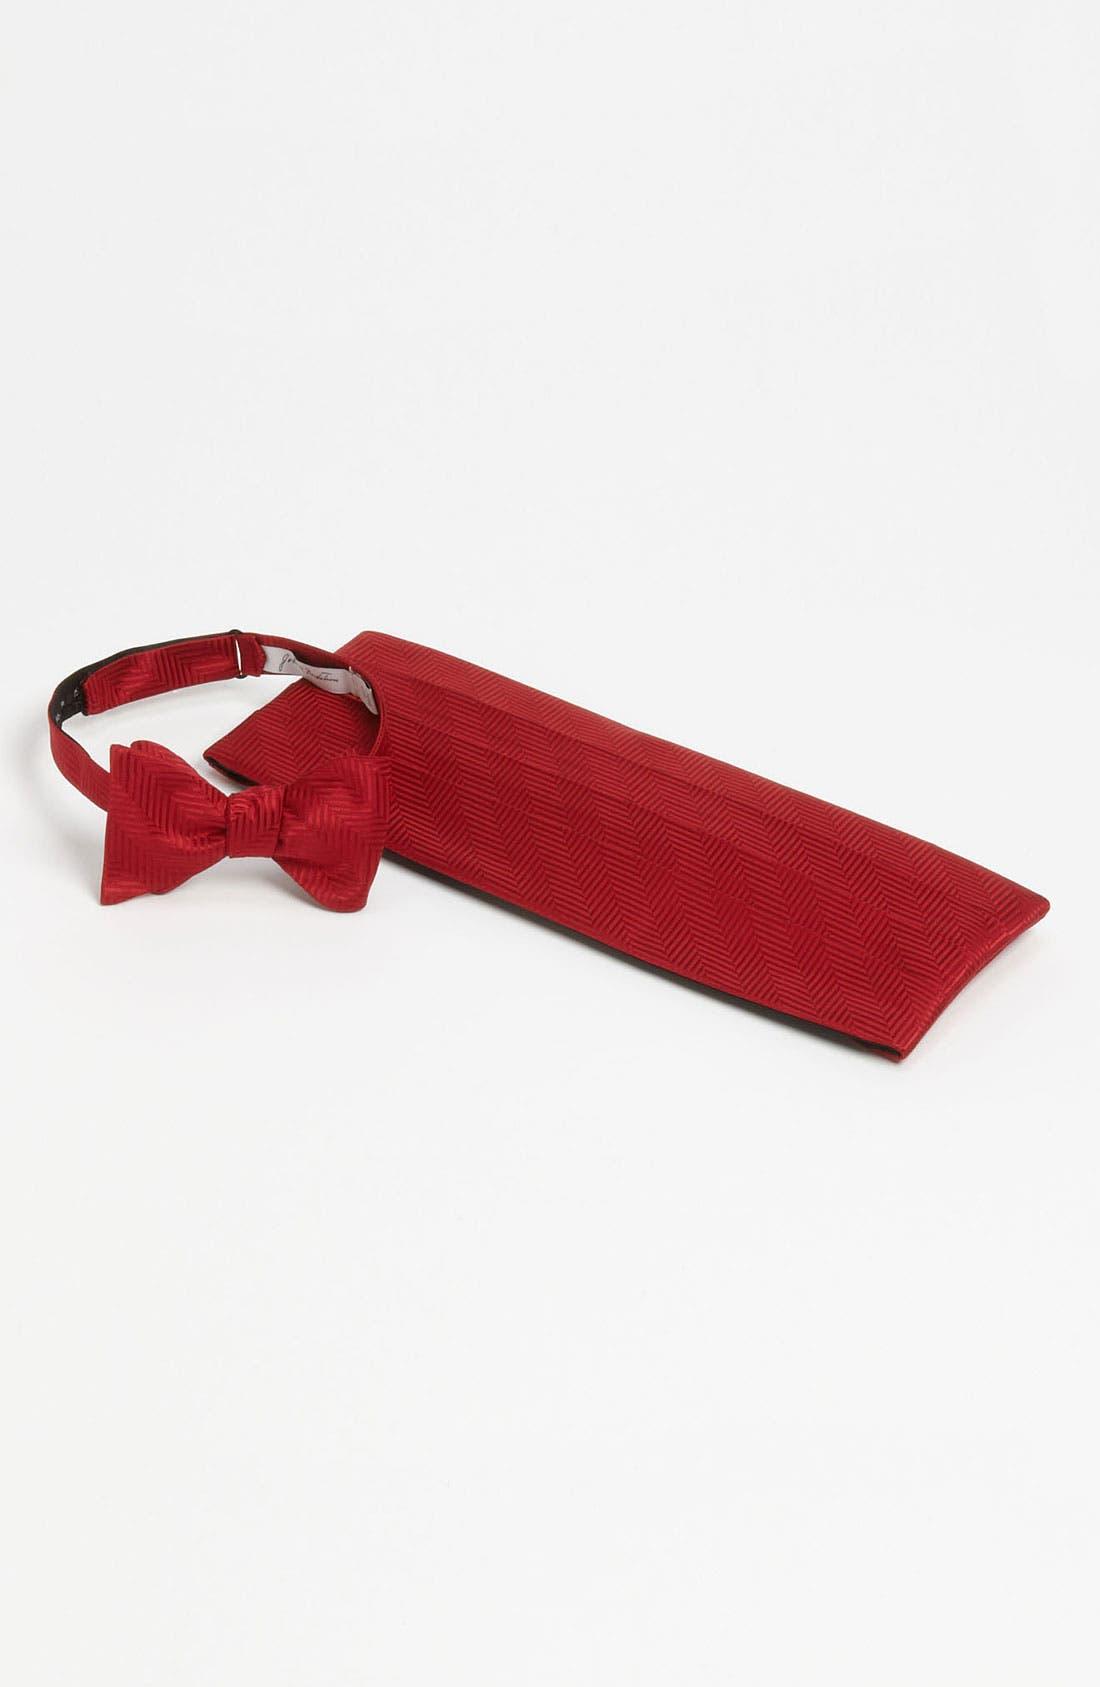 Alternate Image 1 Selected - John W. Nordstrom® Cummerbund & Bow Tie